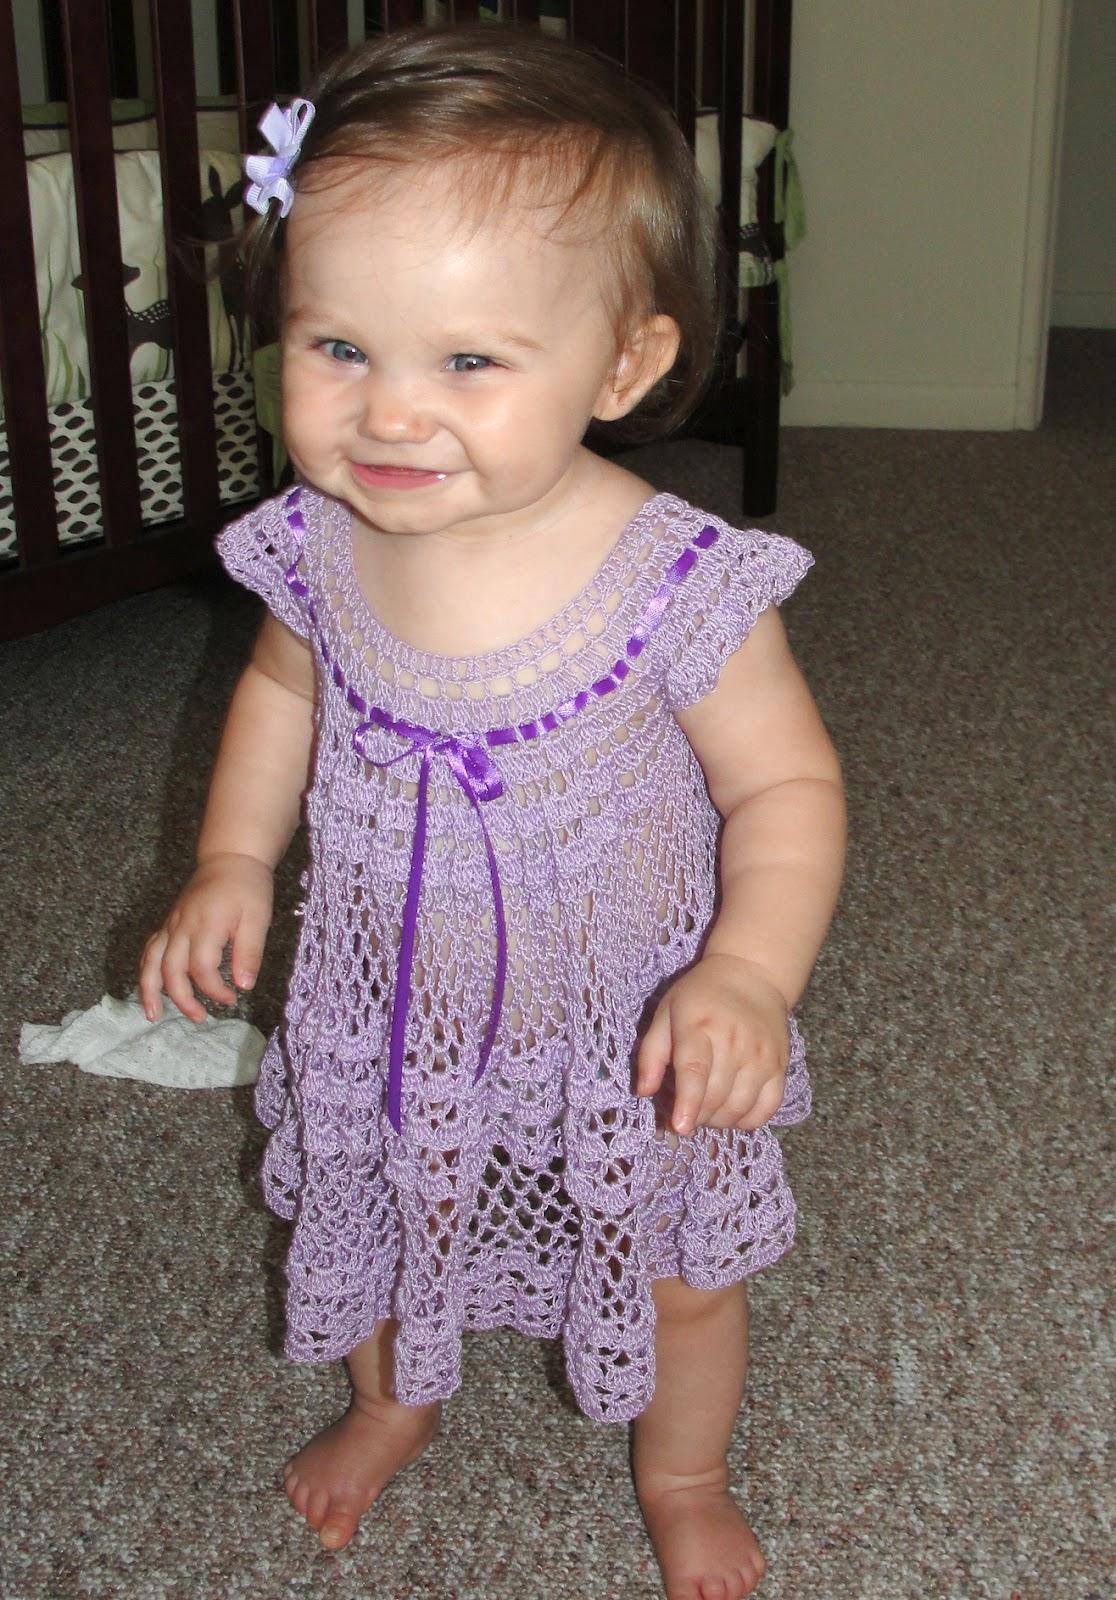 Baby Crochet Patterns For Summer : In Karapoozville: Crochet summer baby dress